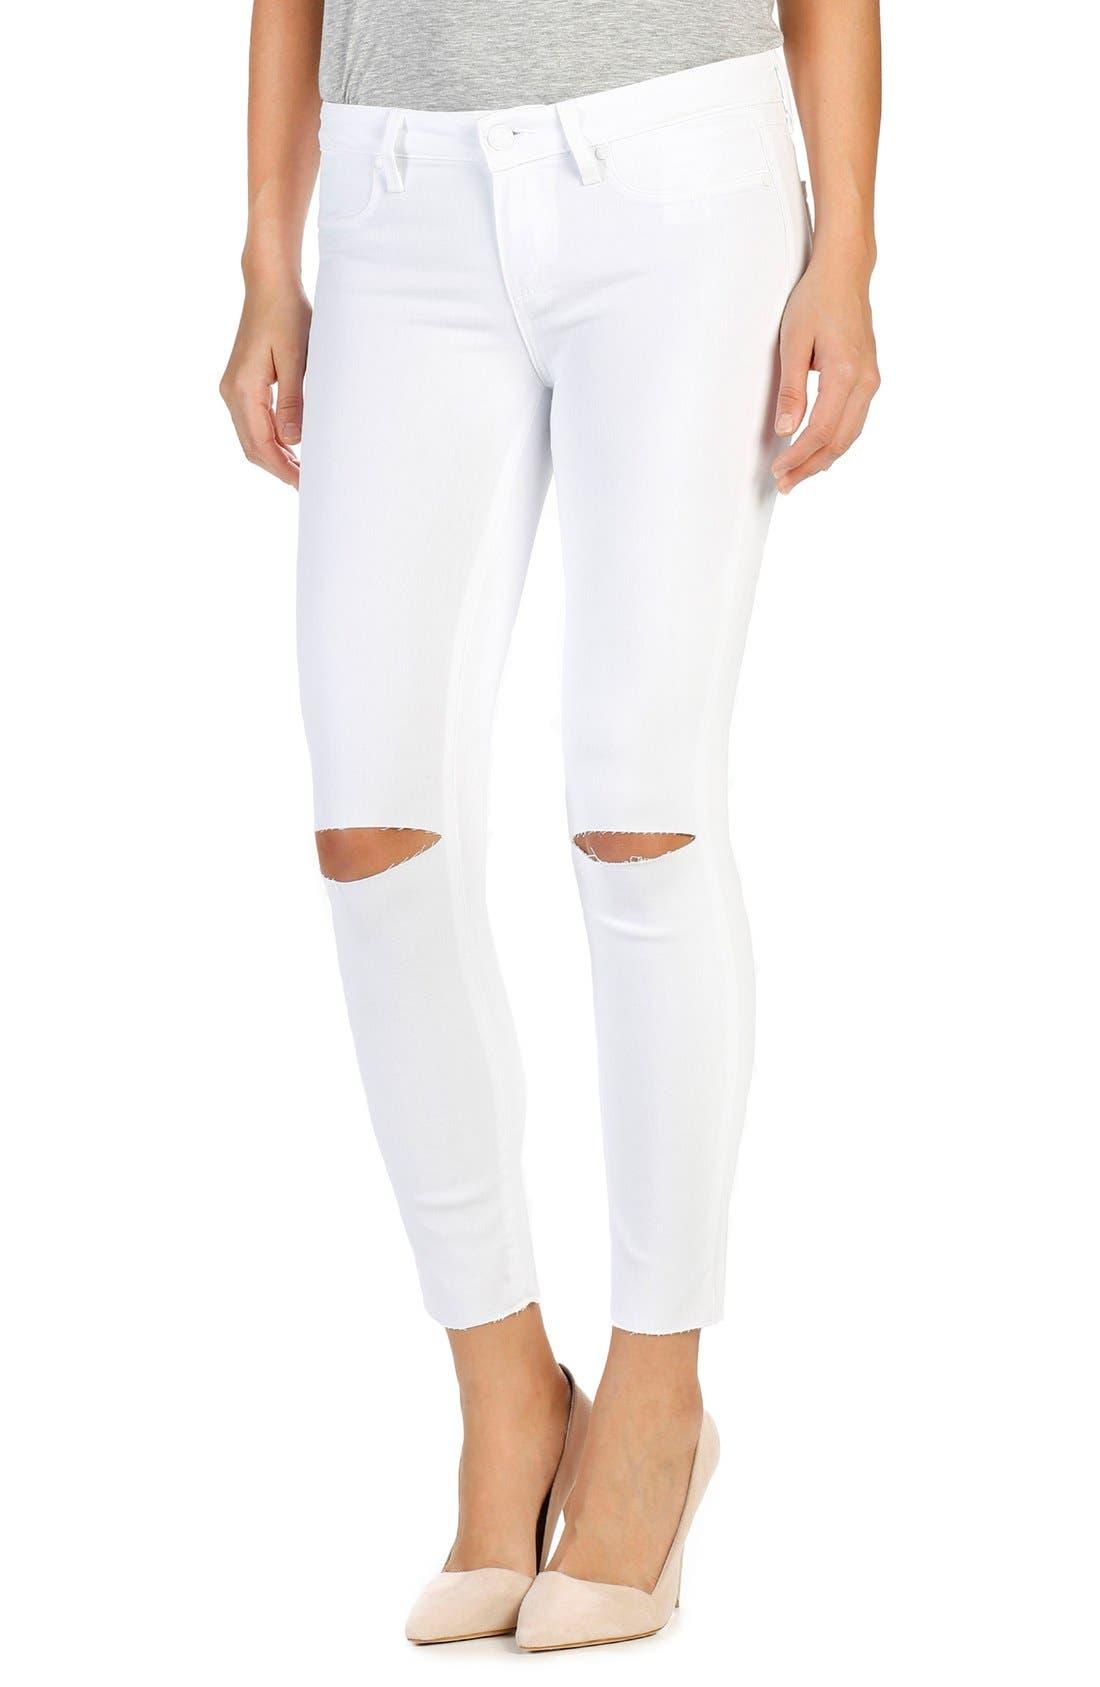 Transcend - Verdugo Ankle Skinny Jeans,                             Main thumbnail 1, color,                             White Cloud Destructed